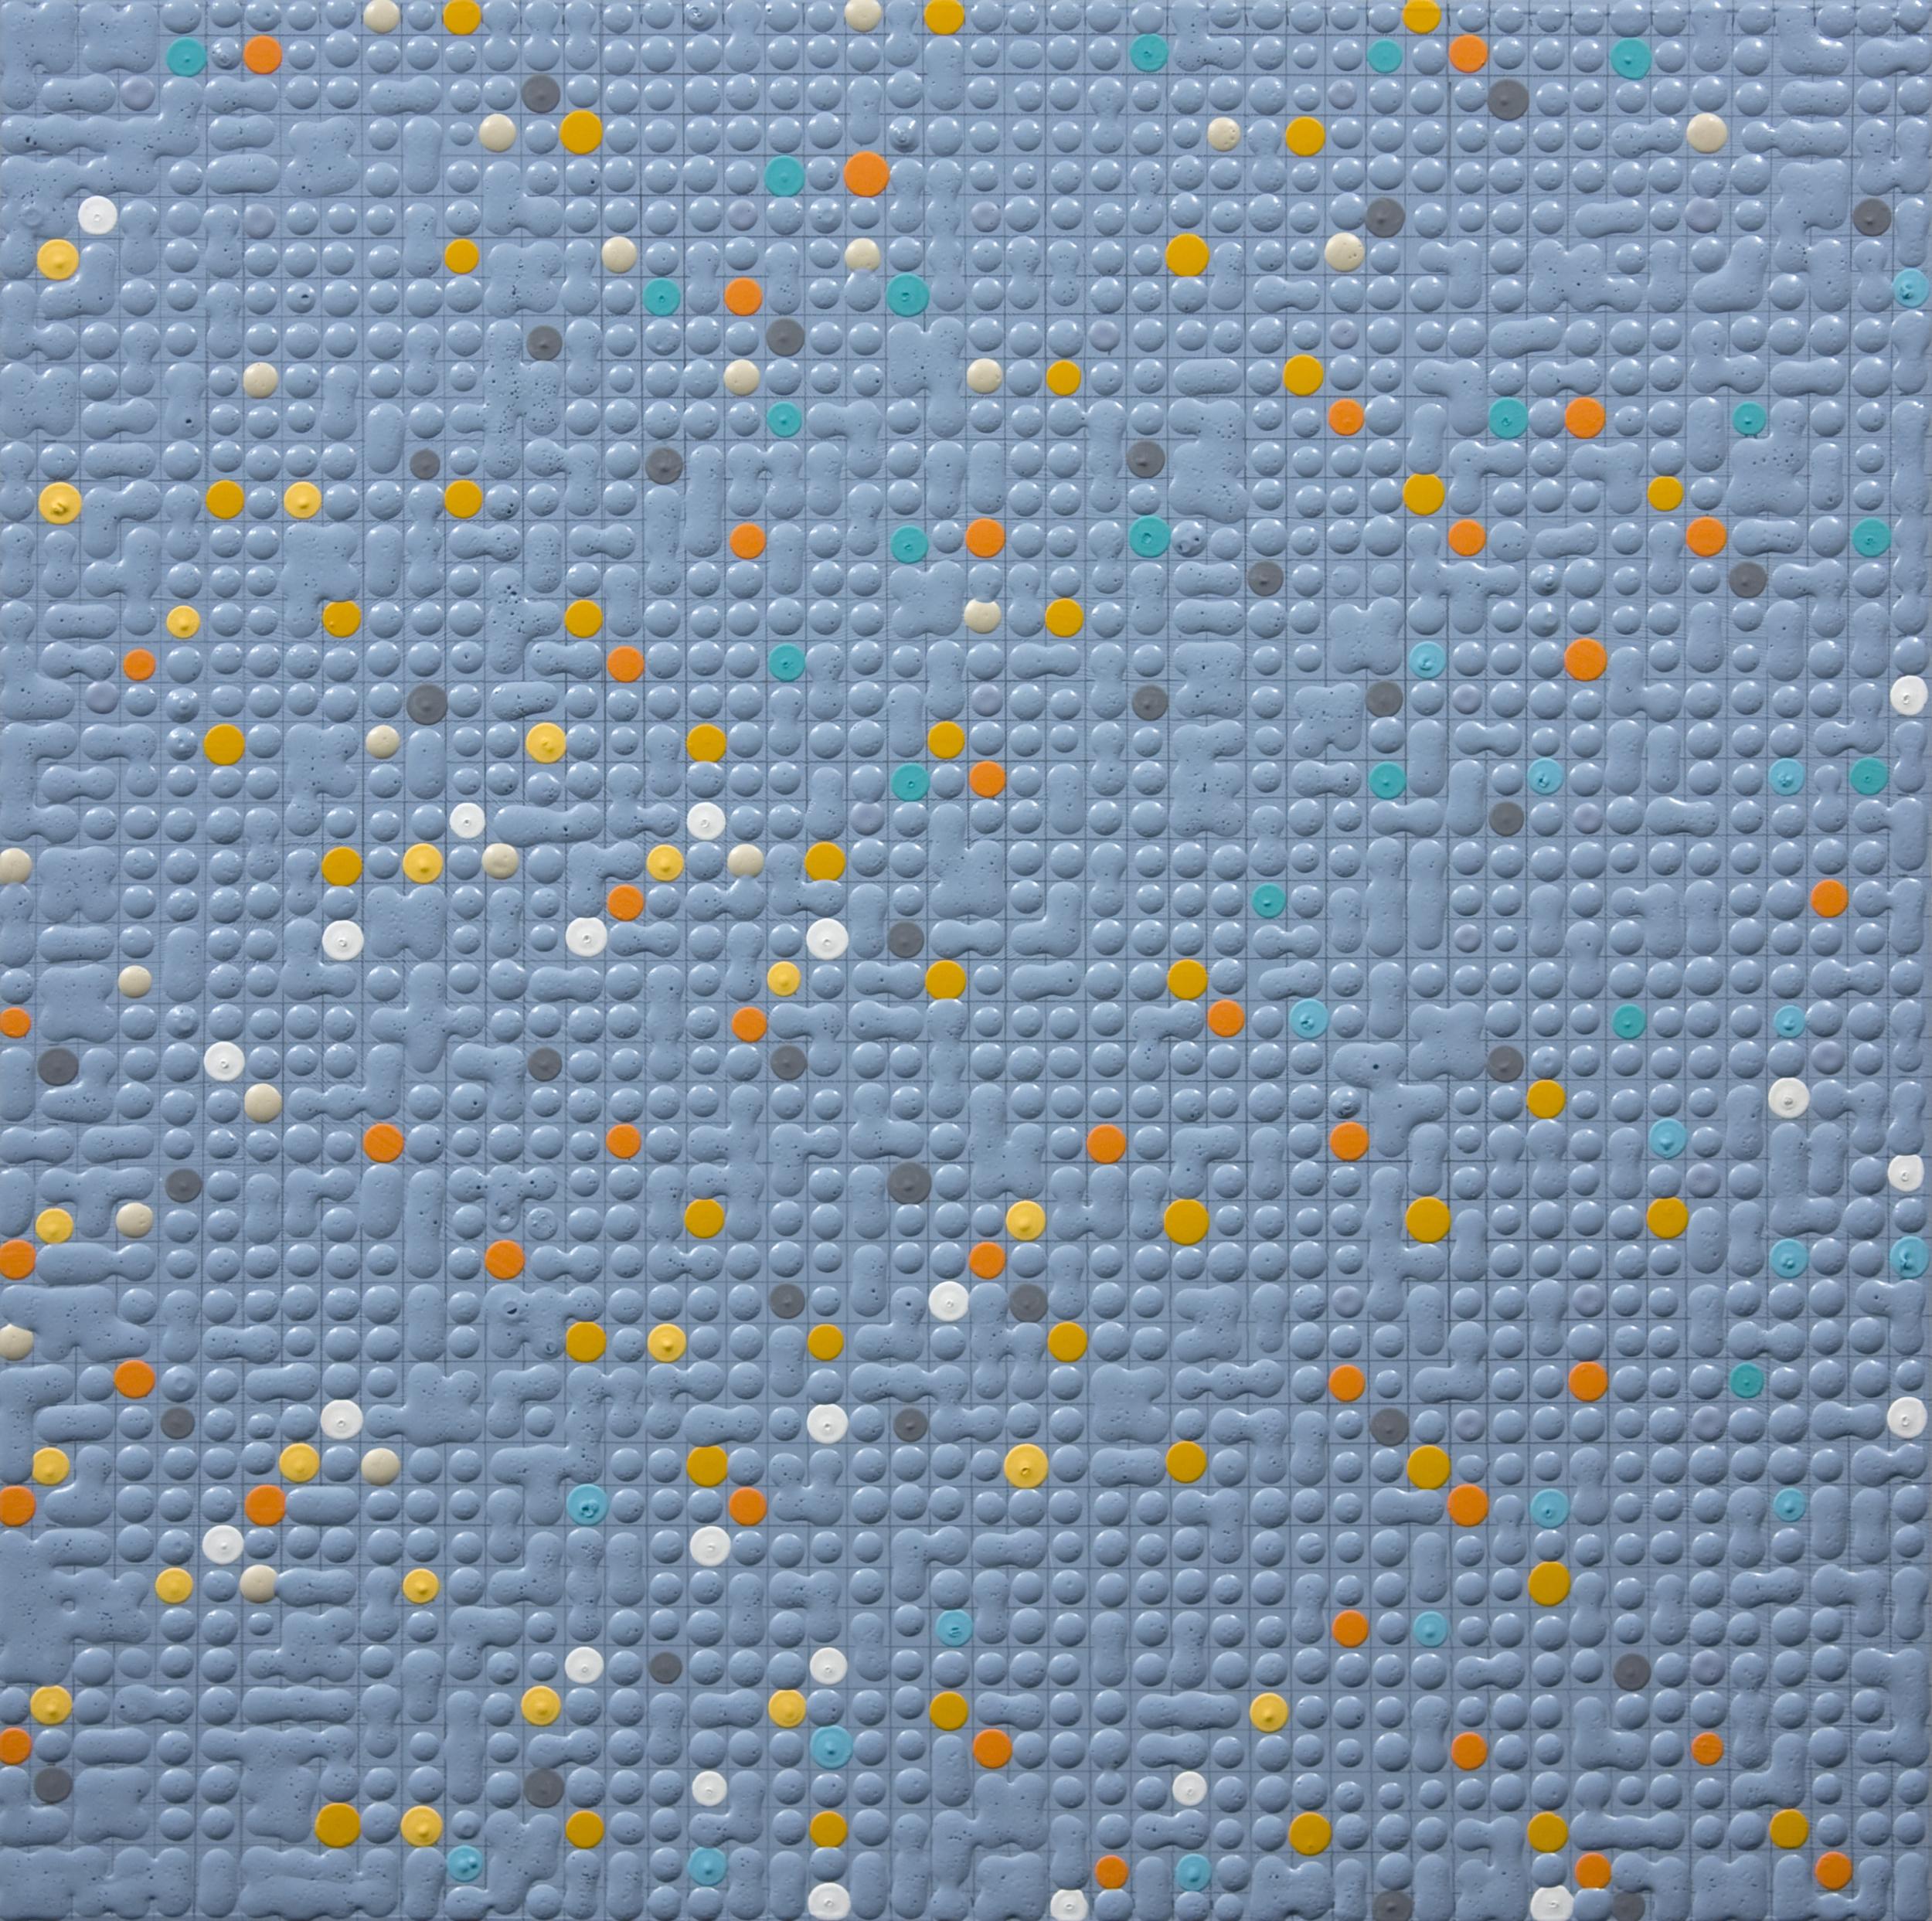 Primary Array #56, acrylic on canvas, 2010, 12 x 12in | 30 x 30cm